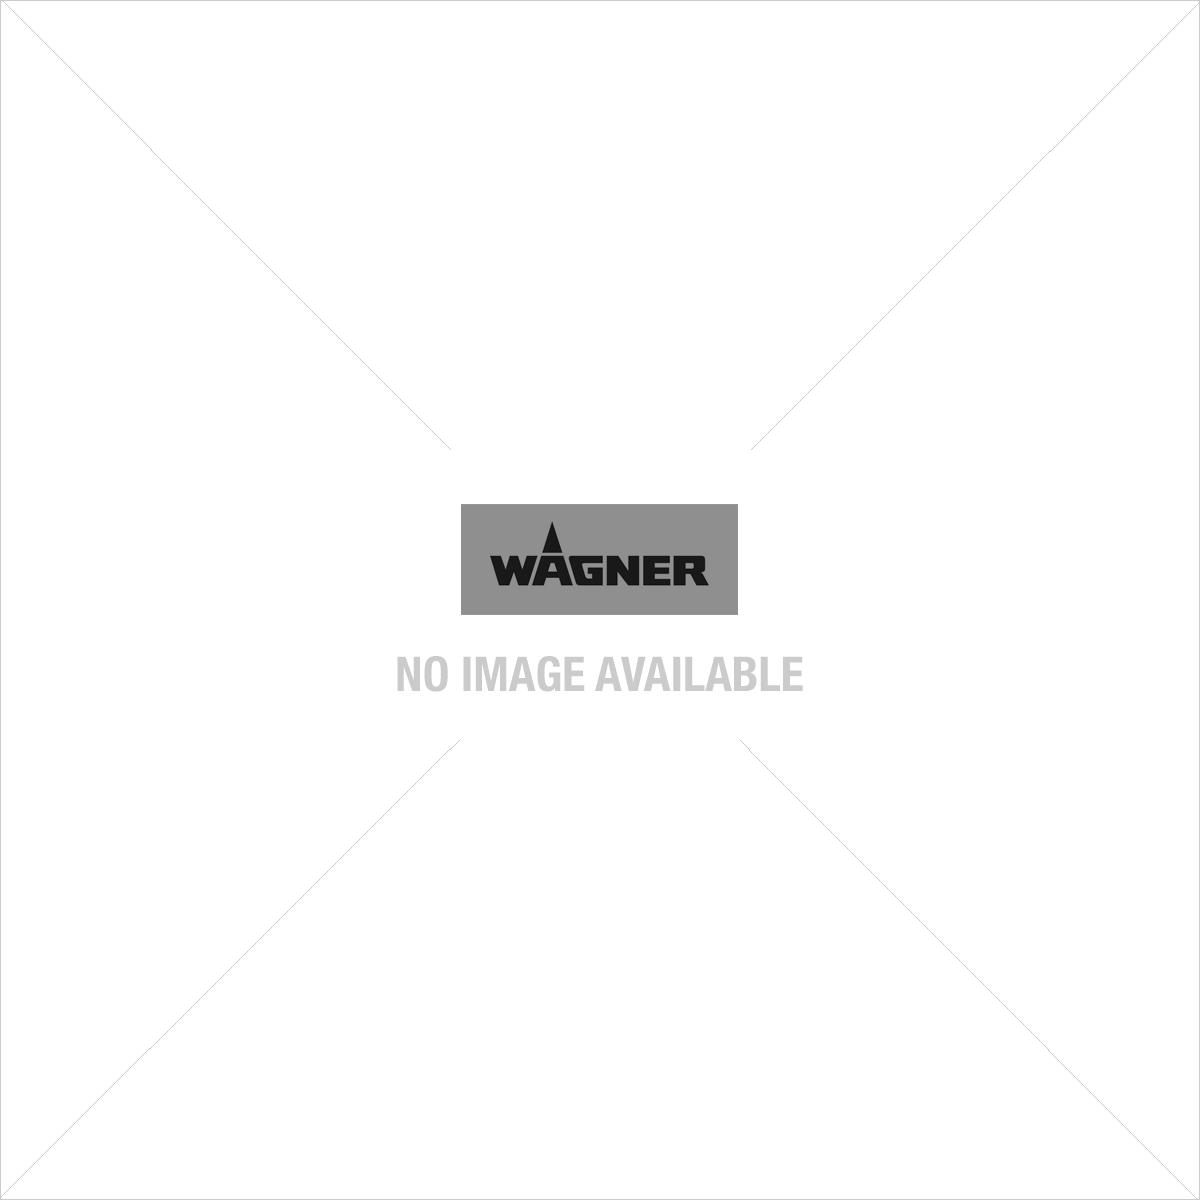 Wagner XVLP 5000 Paint Sprayer